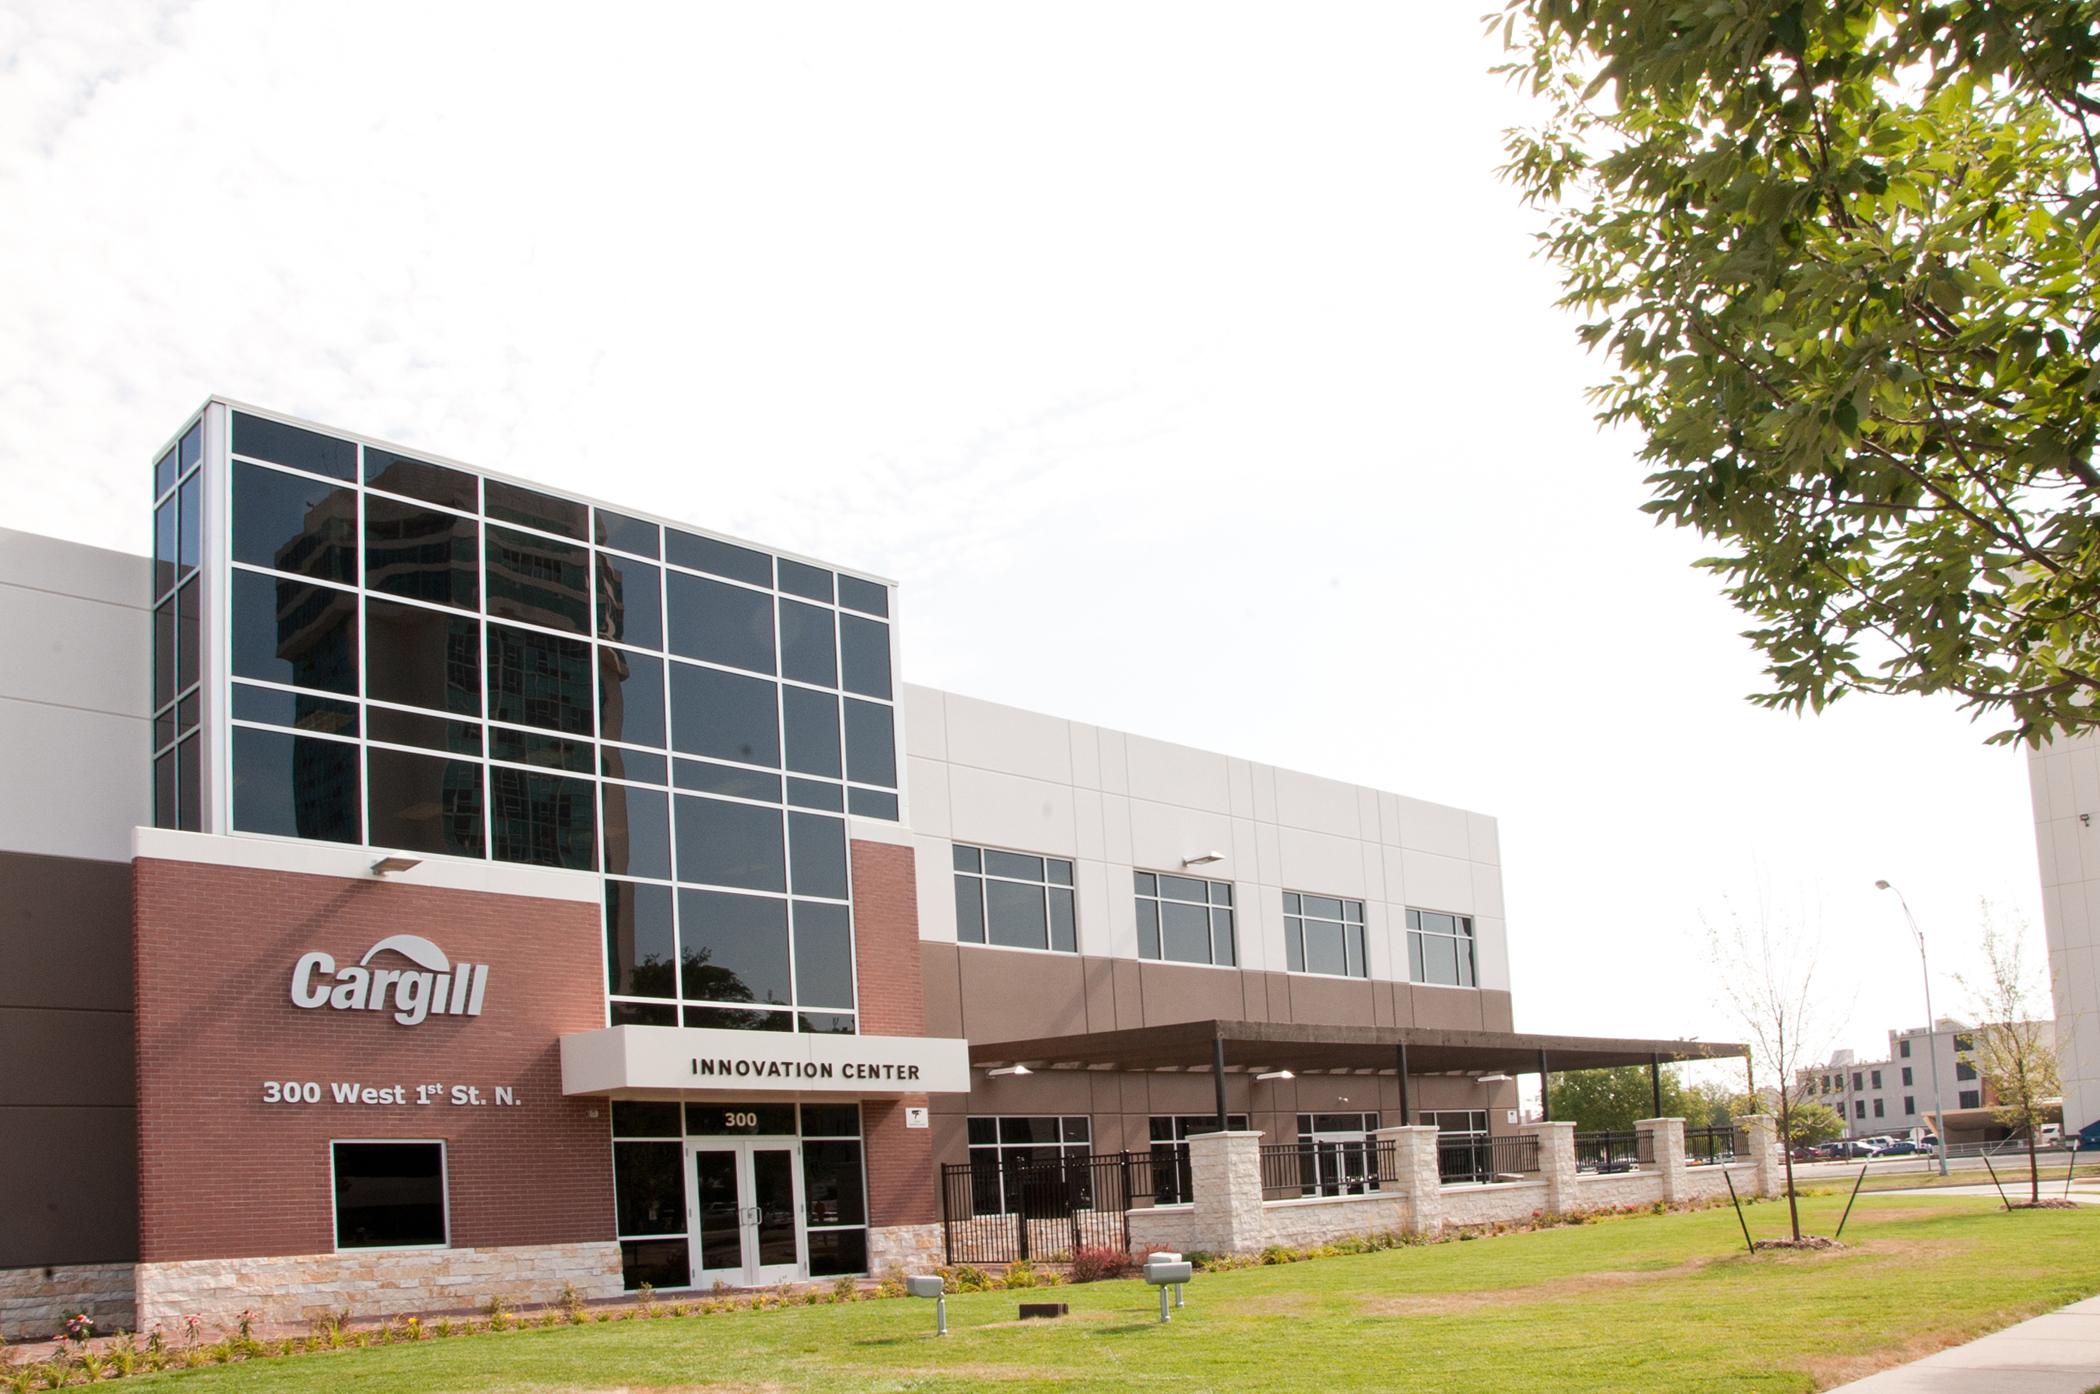 Cargill's Innovation Center in Wichita